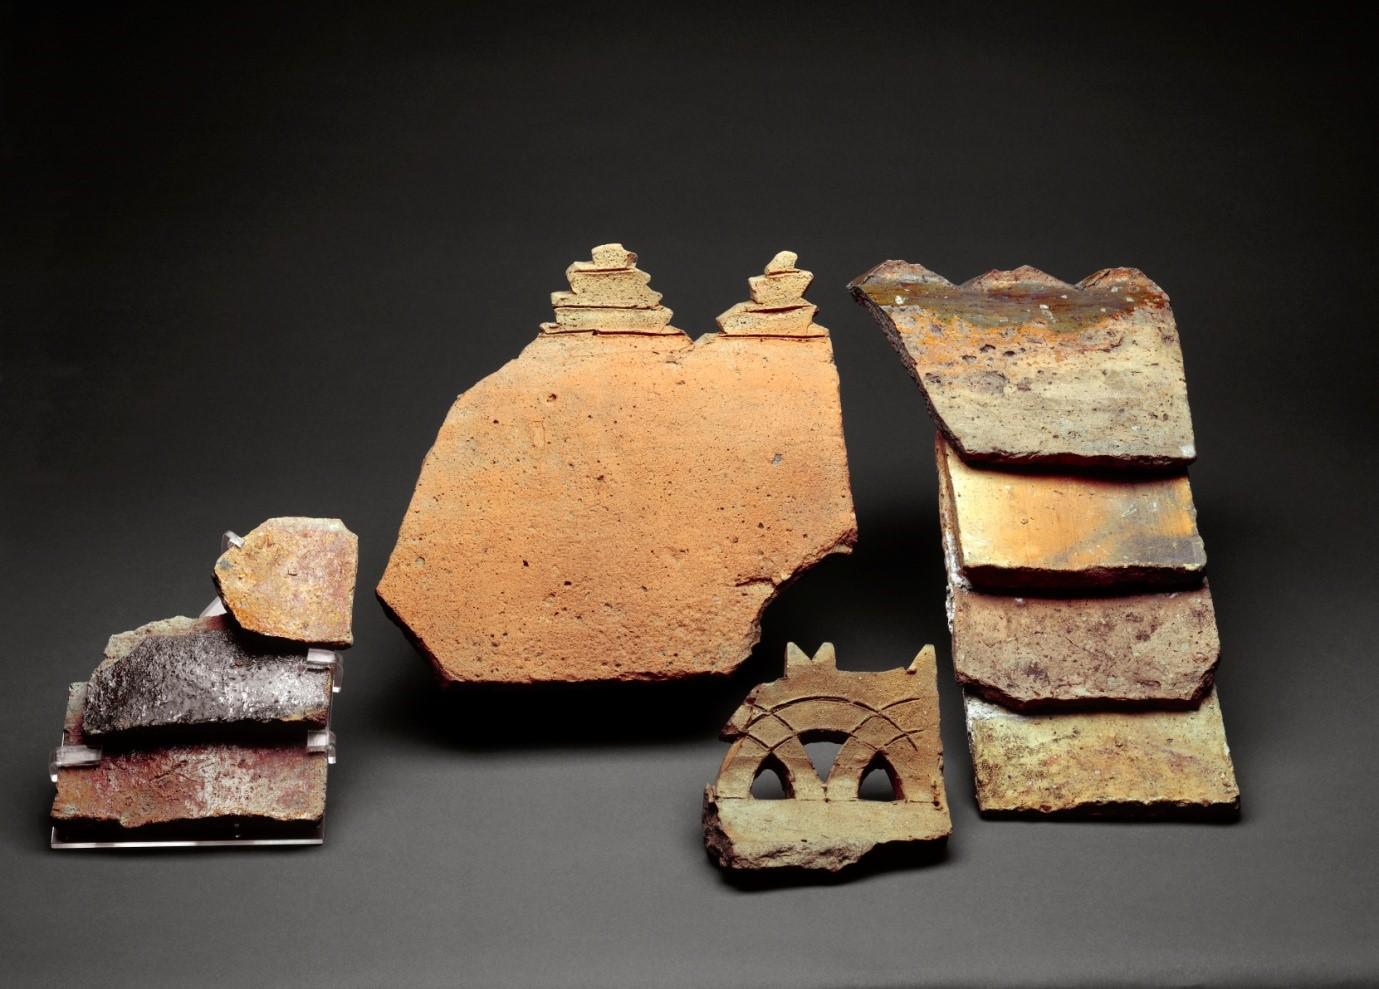 13th century British roof and ridge tiles